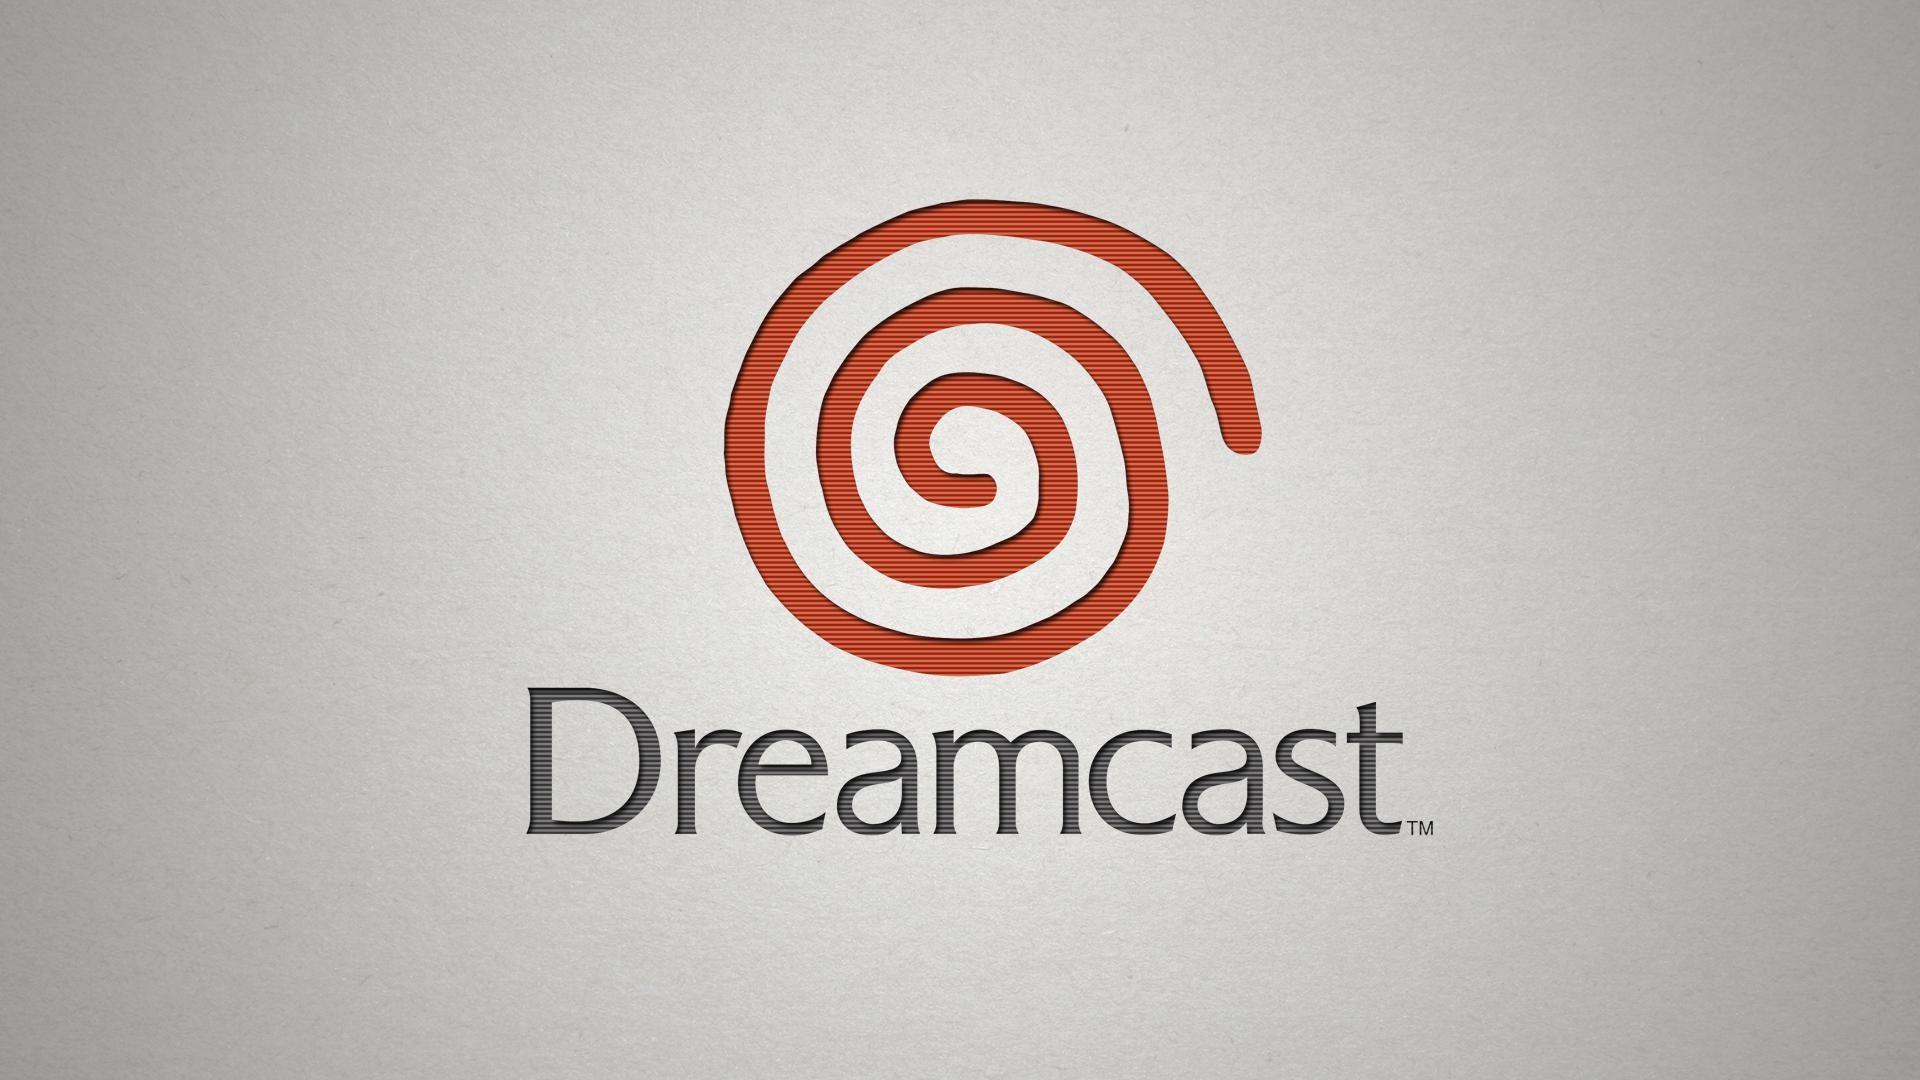 3 Dreamcast Wallpapers | Dreamcast Backgrounds